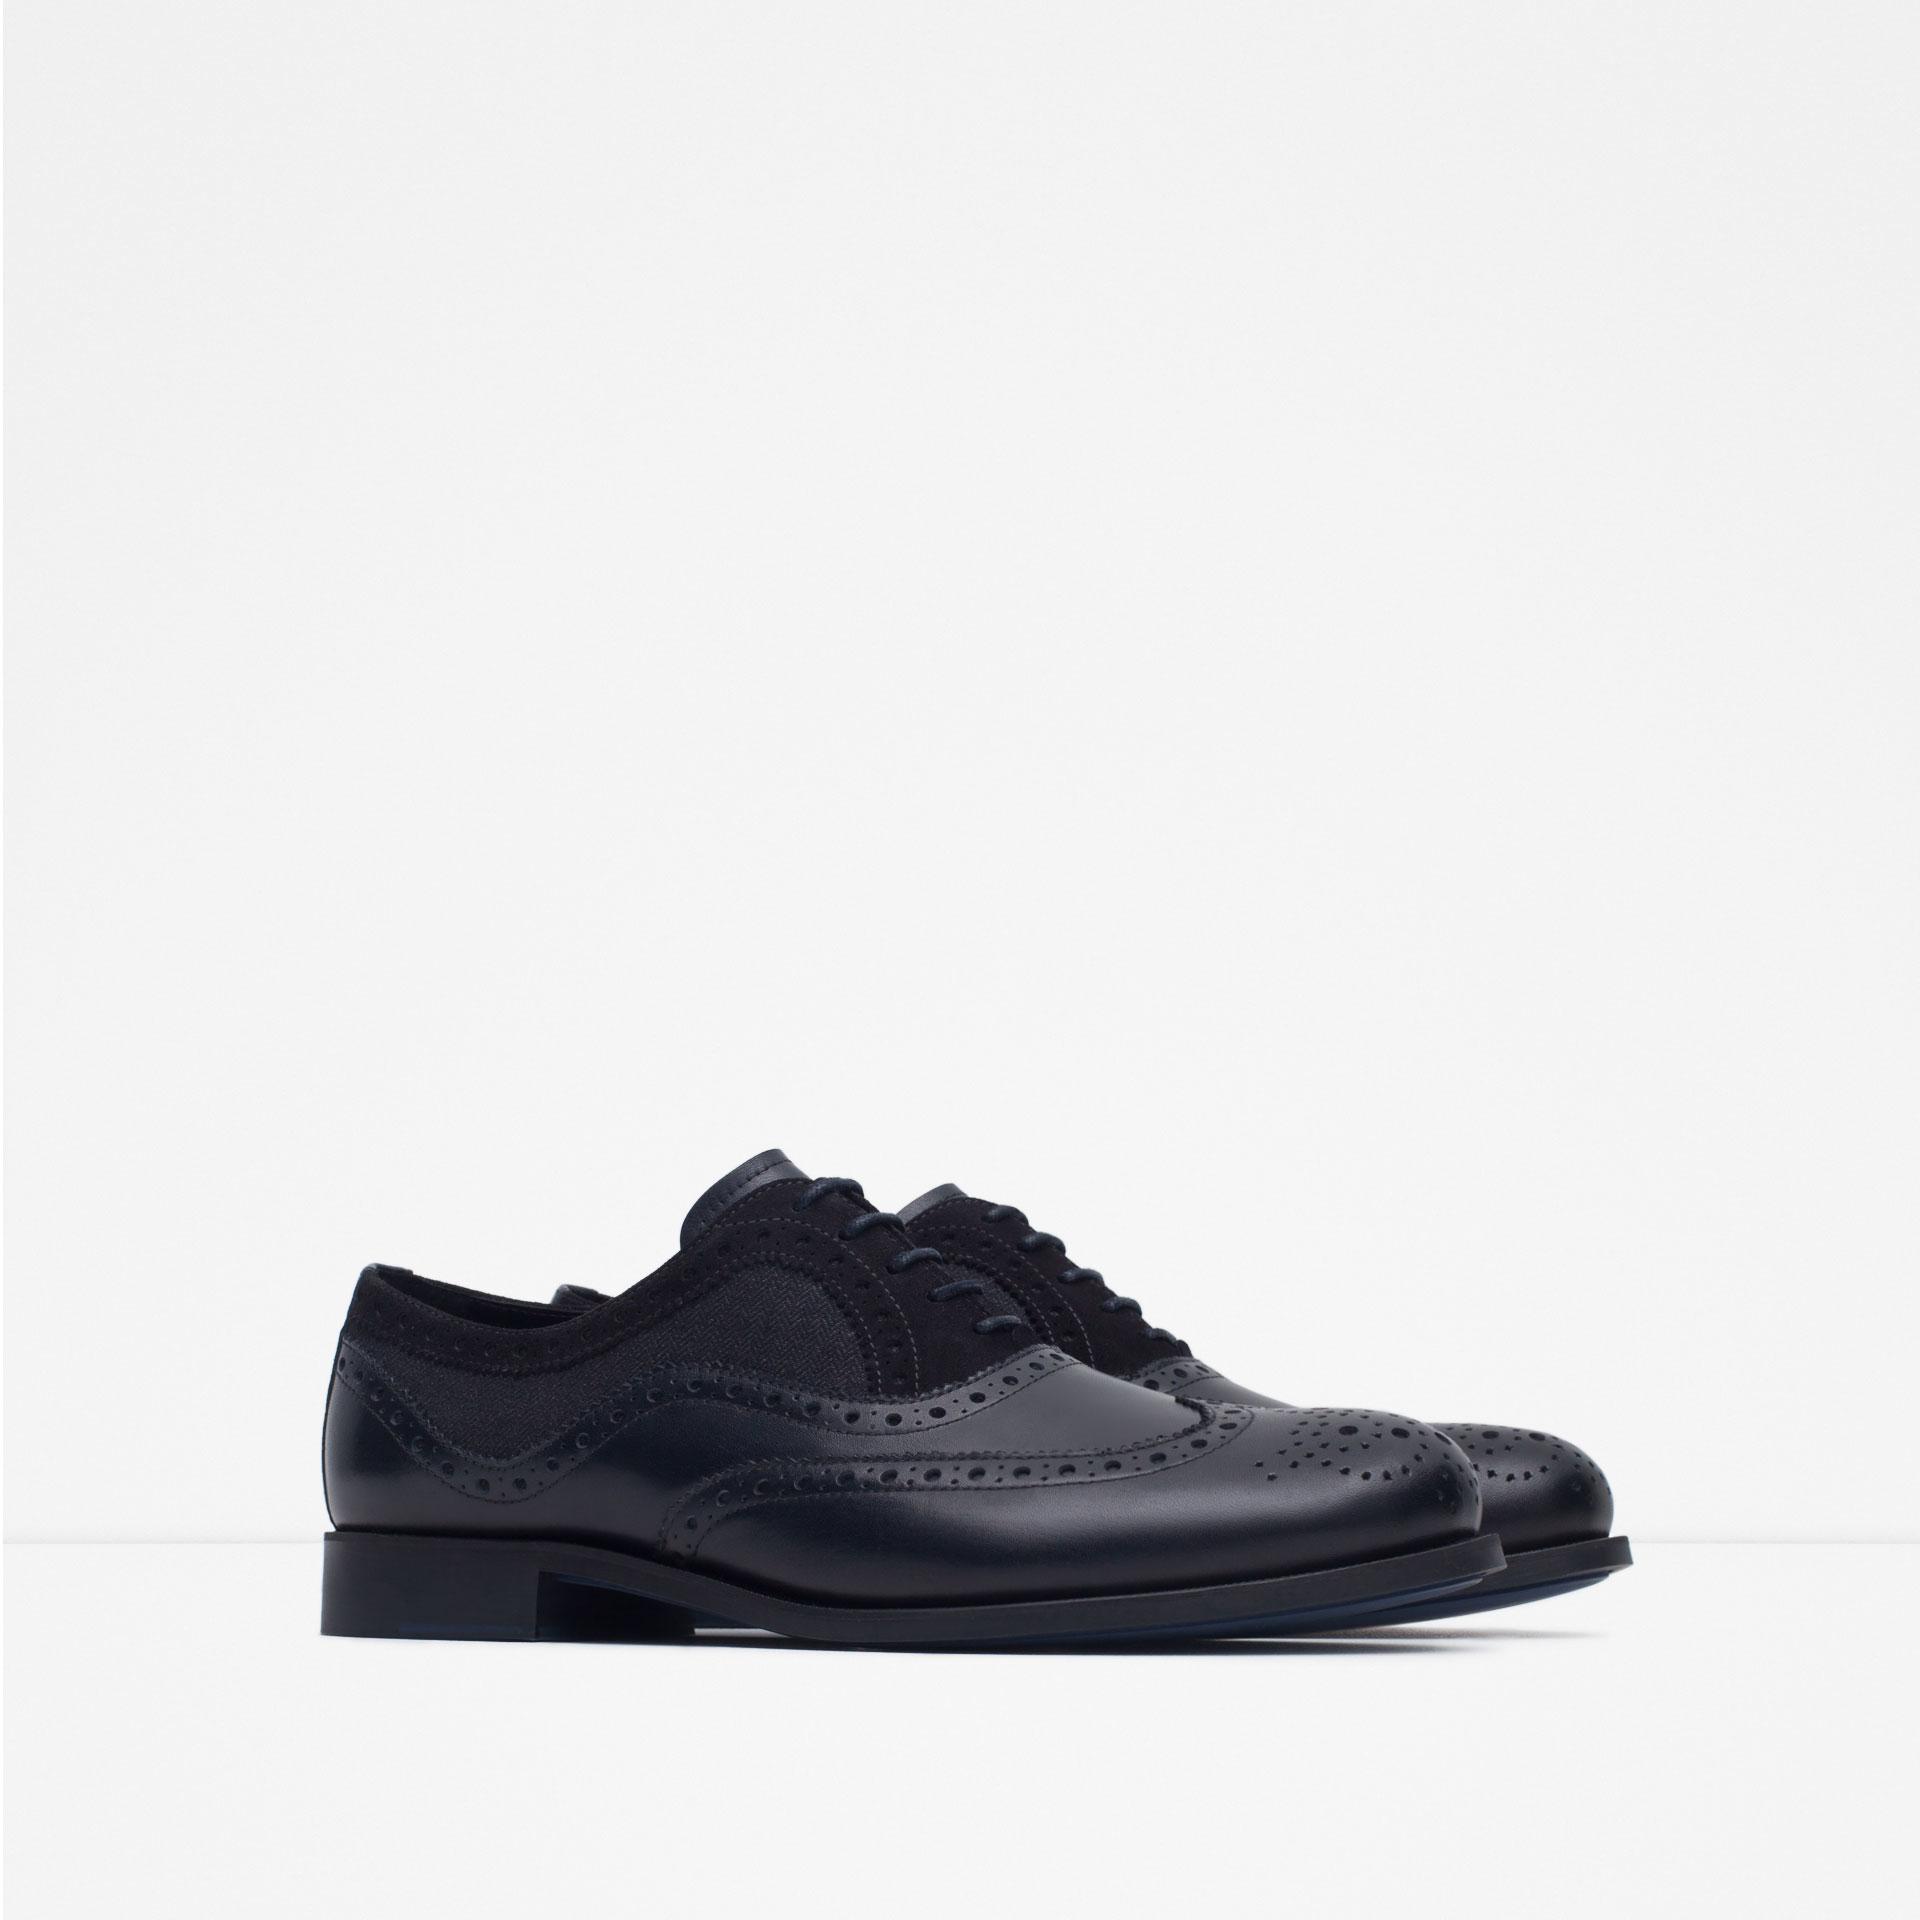 Beautiful Zara Patent Leather Oxford Shoe In Black For Men  Lyst